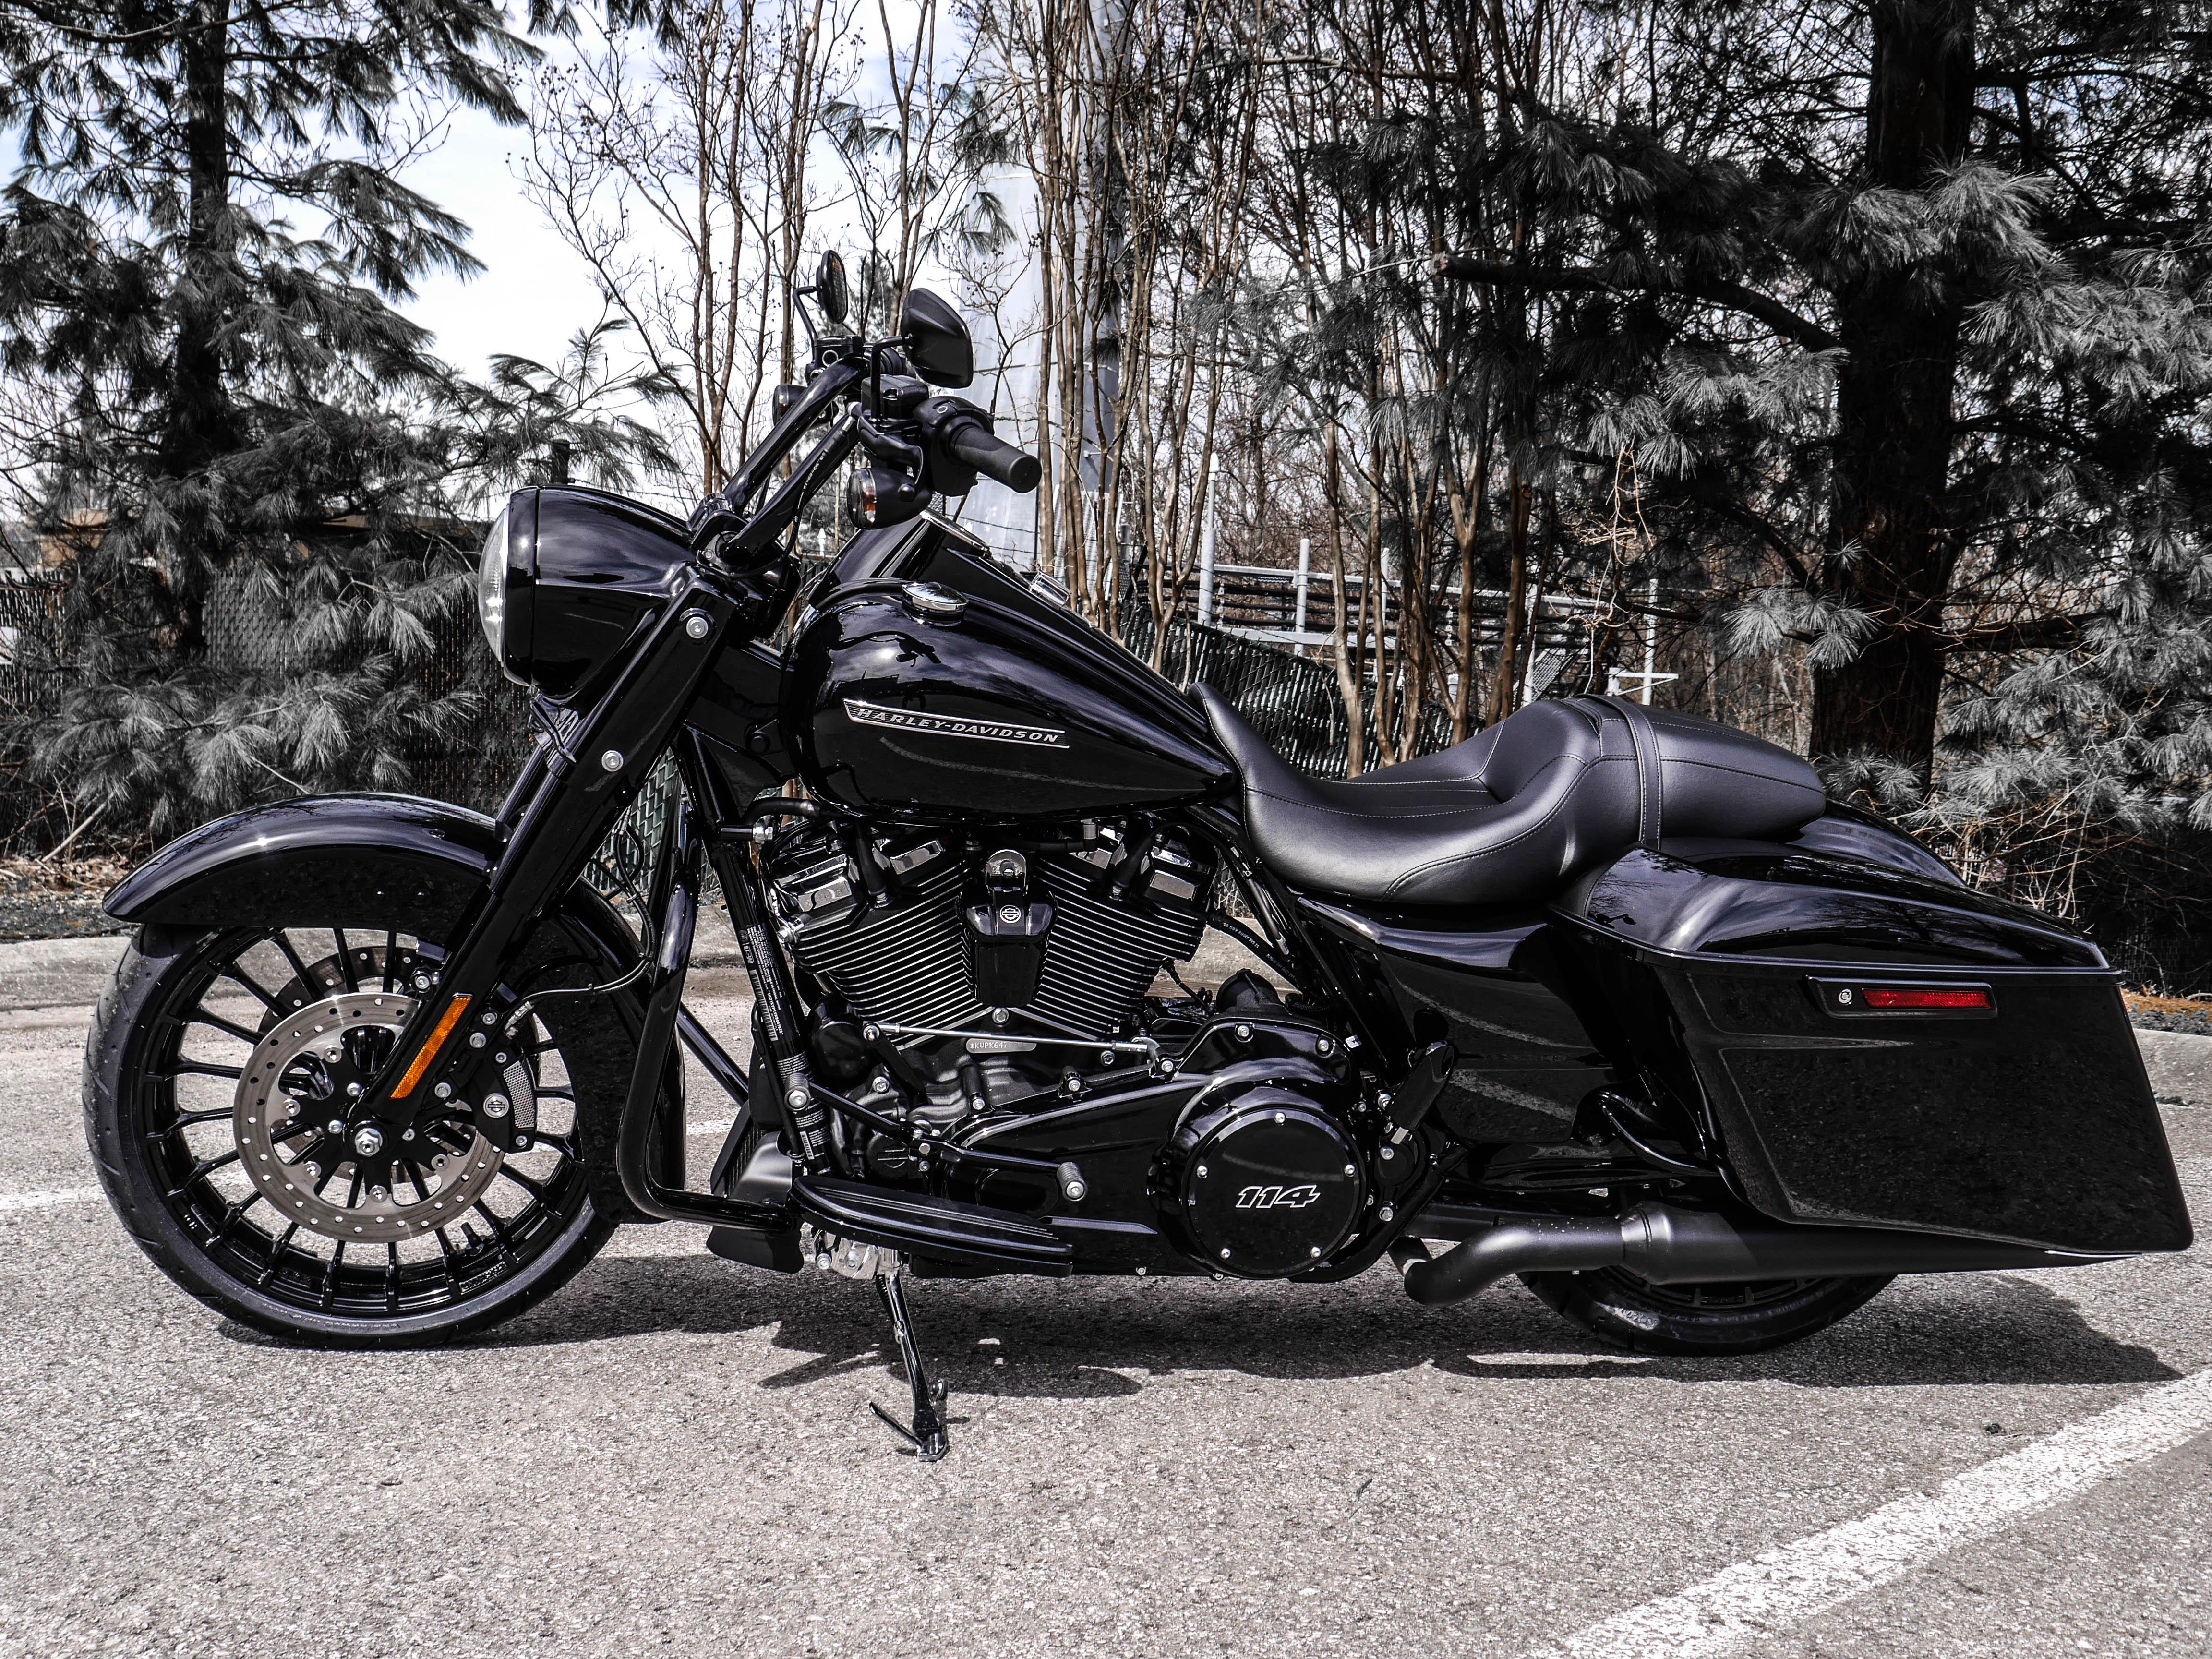 New 2019 Harley-Davidson Road King Special in Franklin # ...